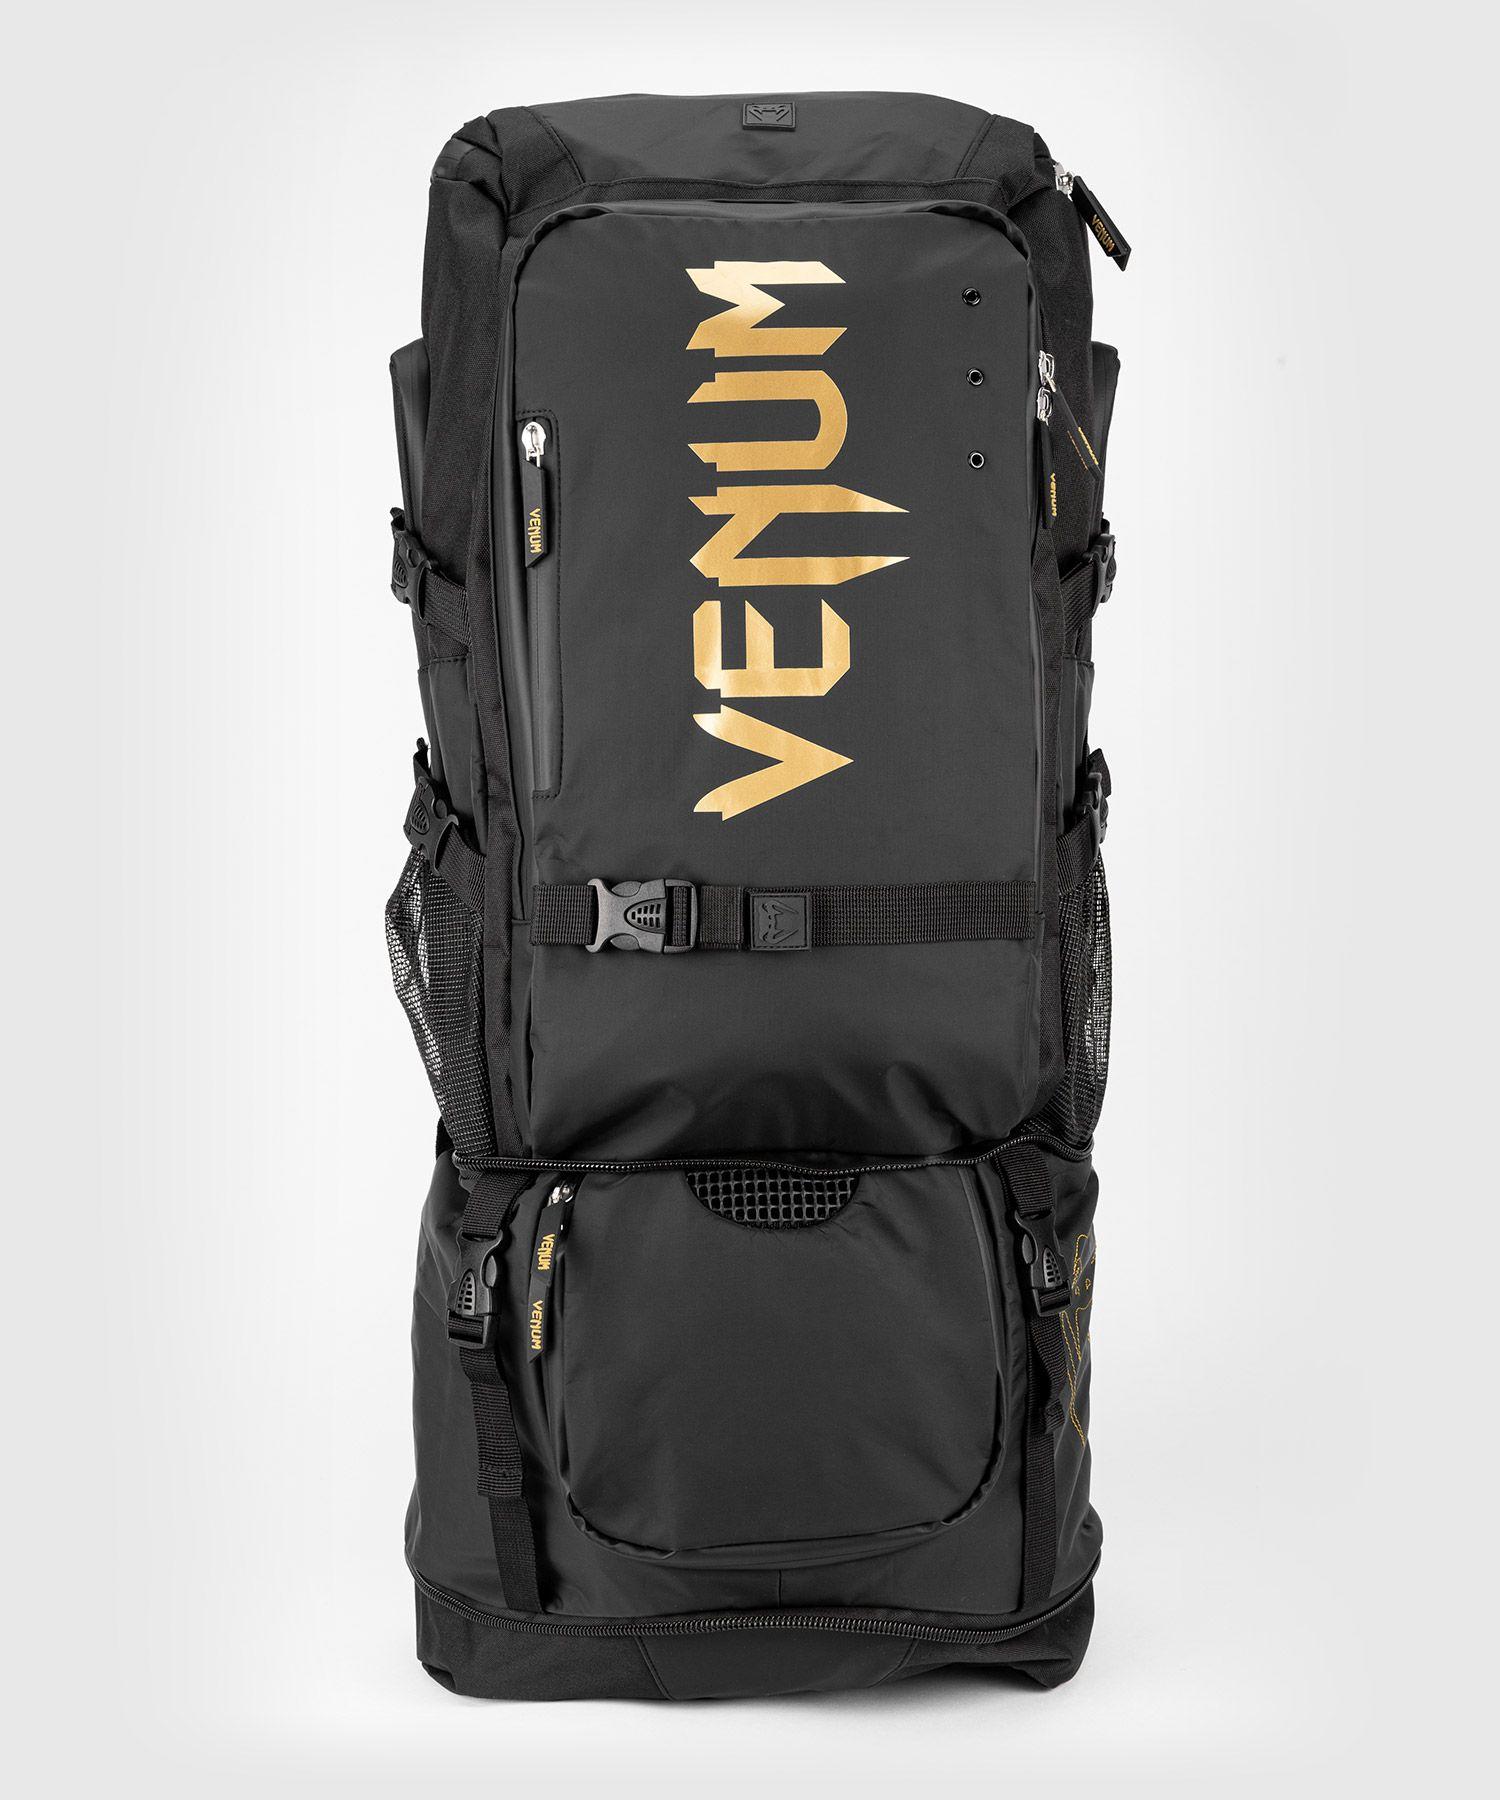 Sac à dos Venum Challenger Xtrem Evo - Noir/Or